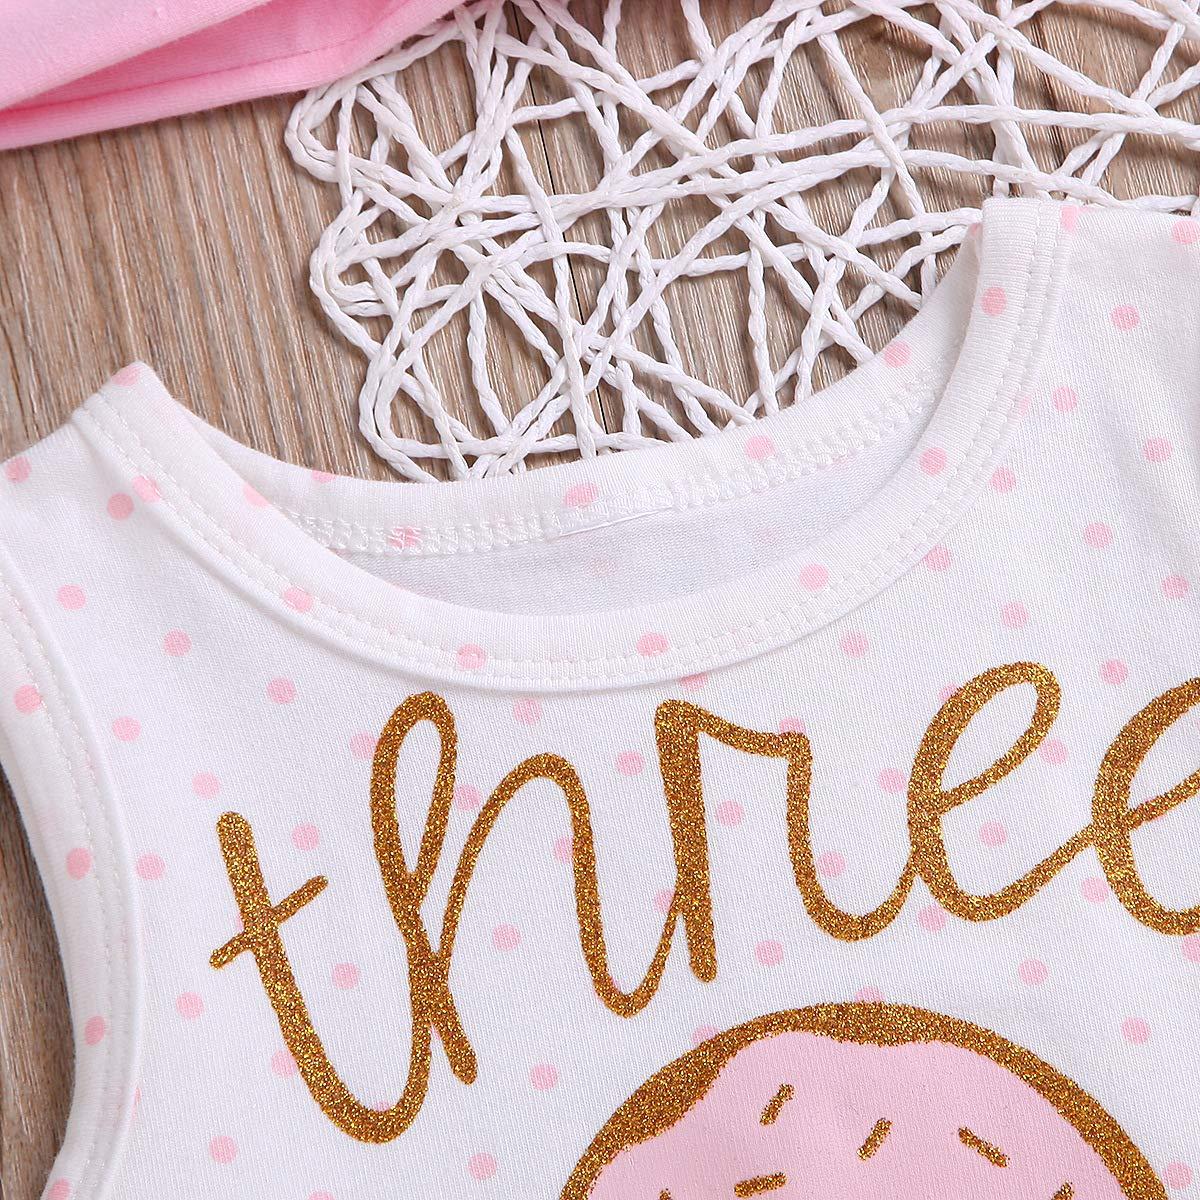 Toddler Baby Girl 1st Birthday Outfit Sleeveless One Donut Print Tutu Dress Headband Set